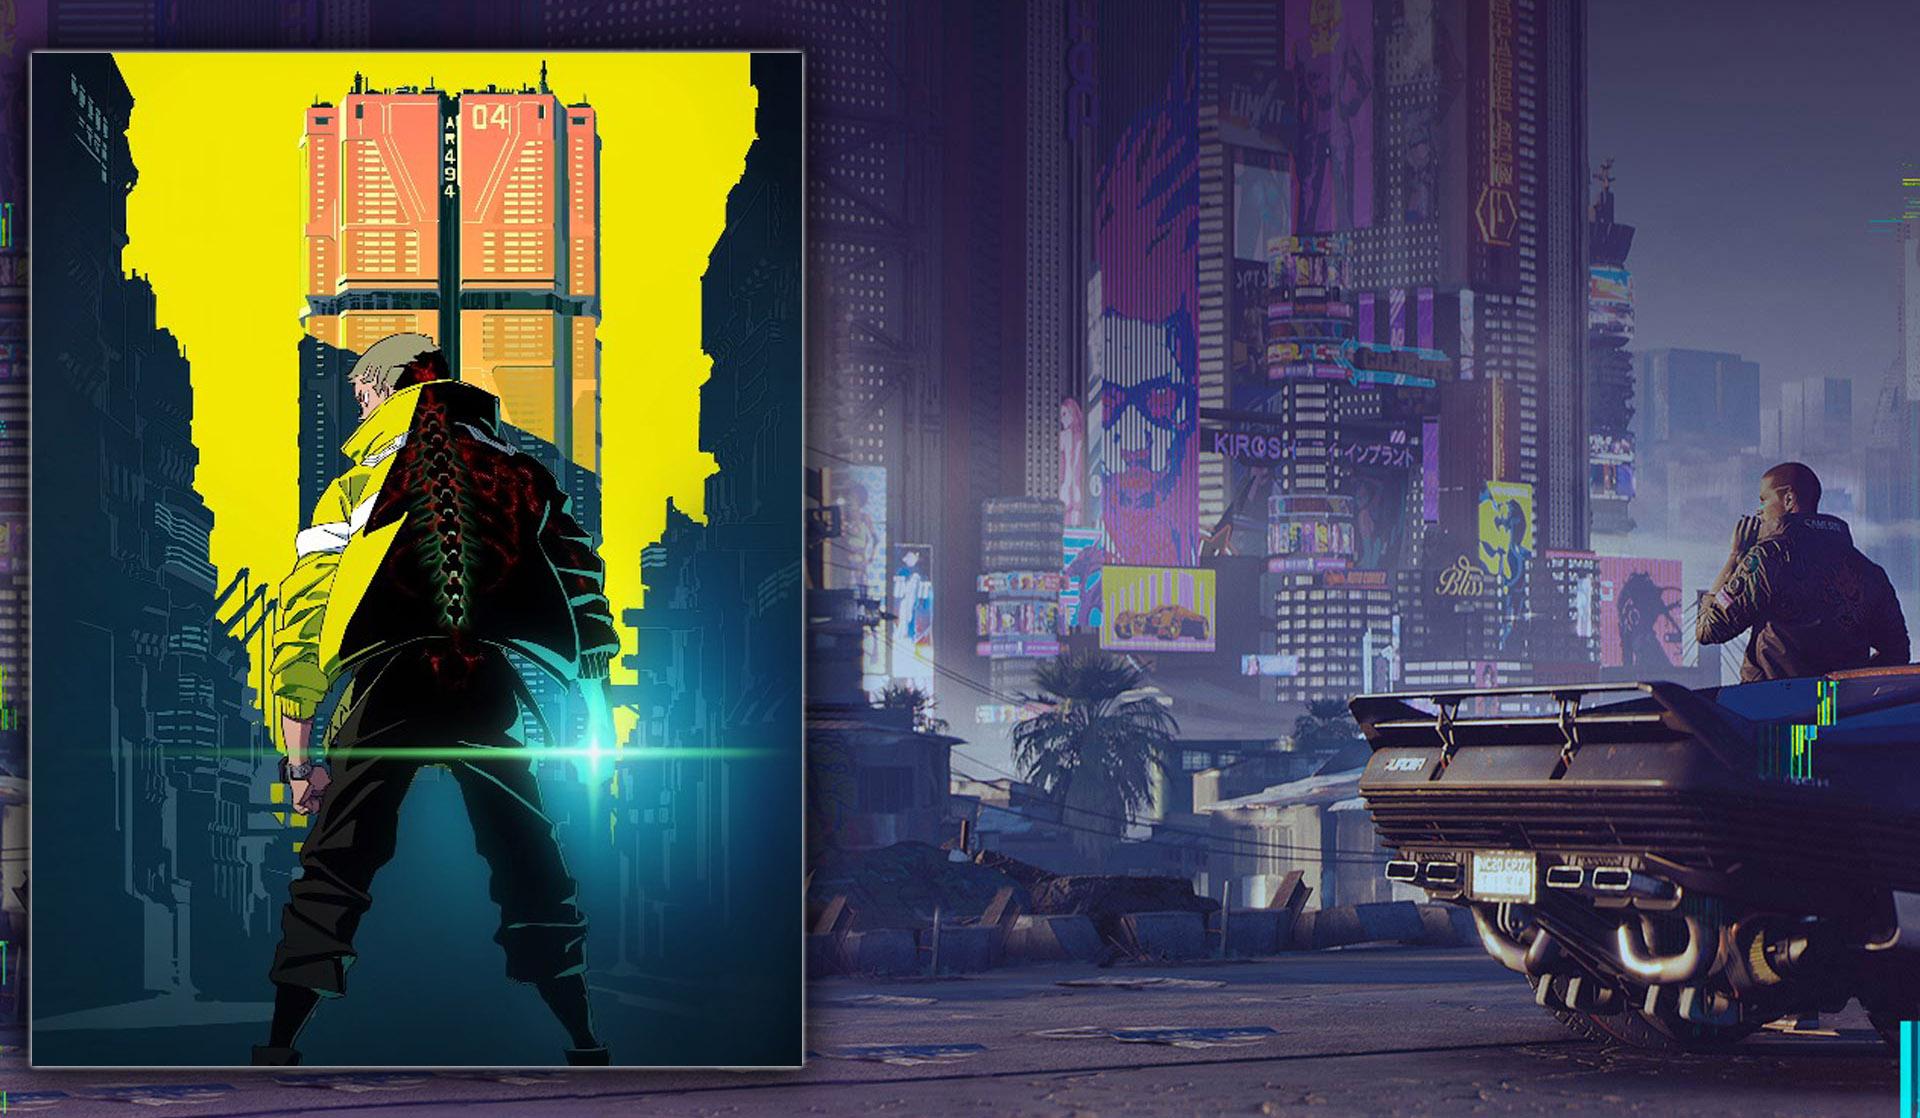 Netflix выпустит аниме-сериал по мотивам игры Cyberpunk 2077